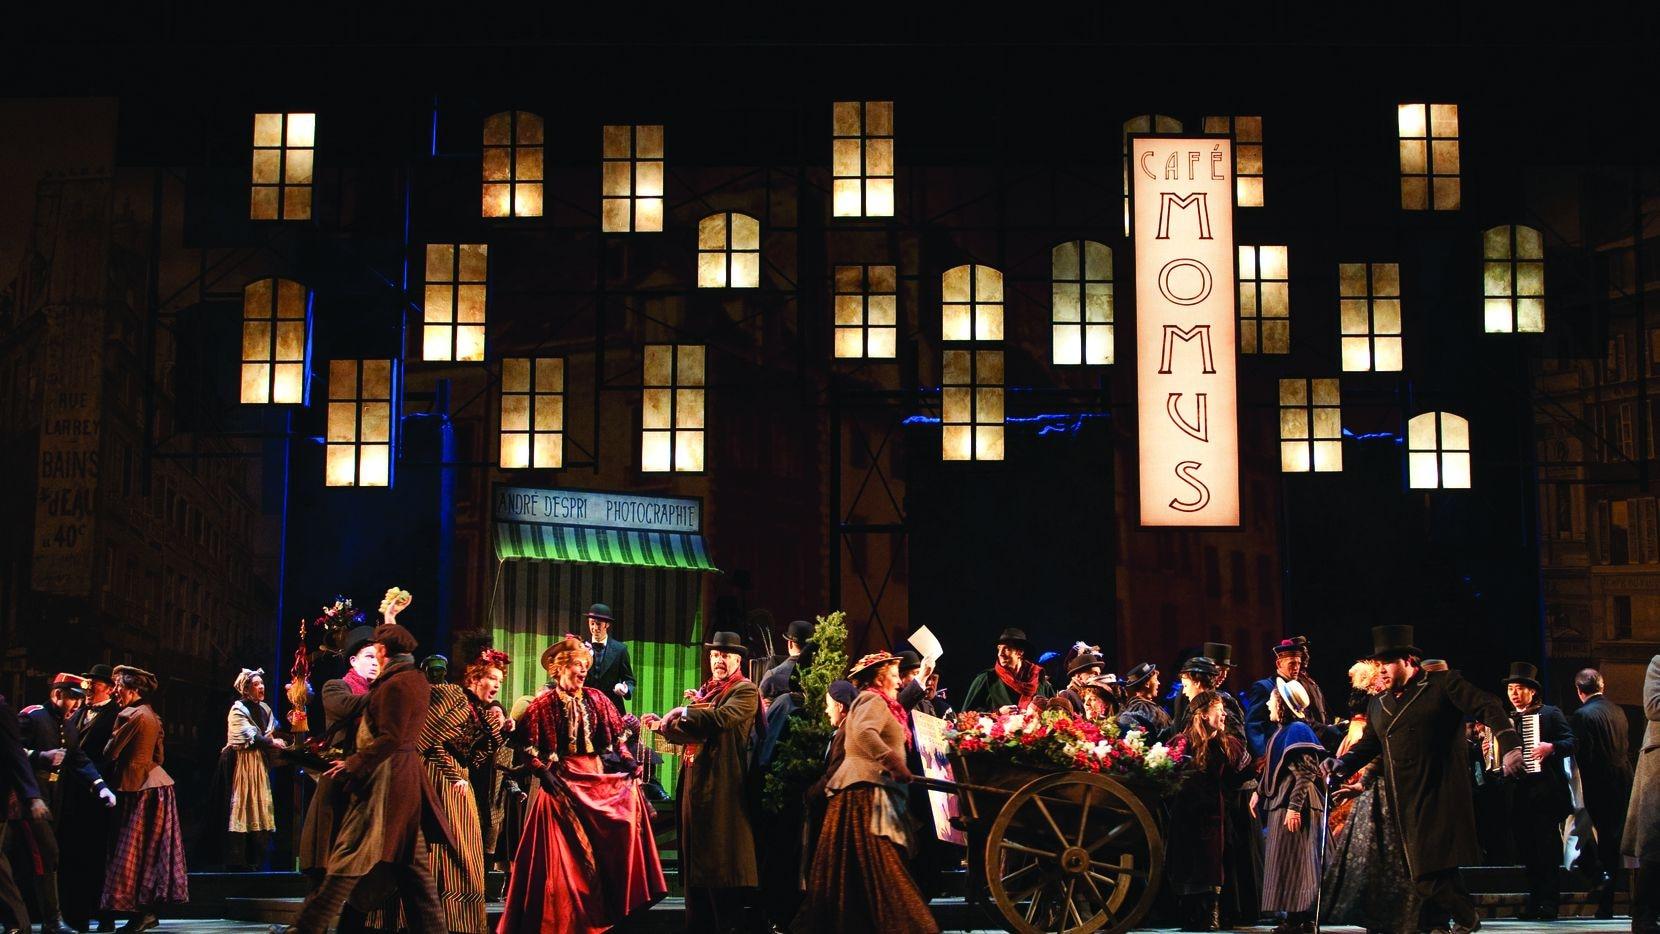 A performance of La bohème.